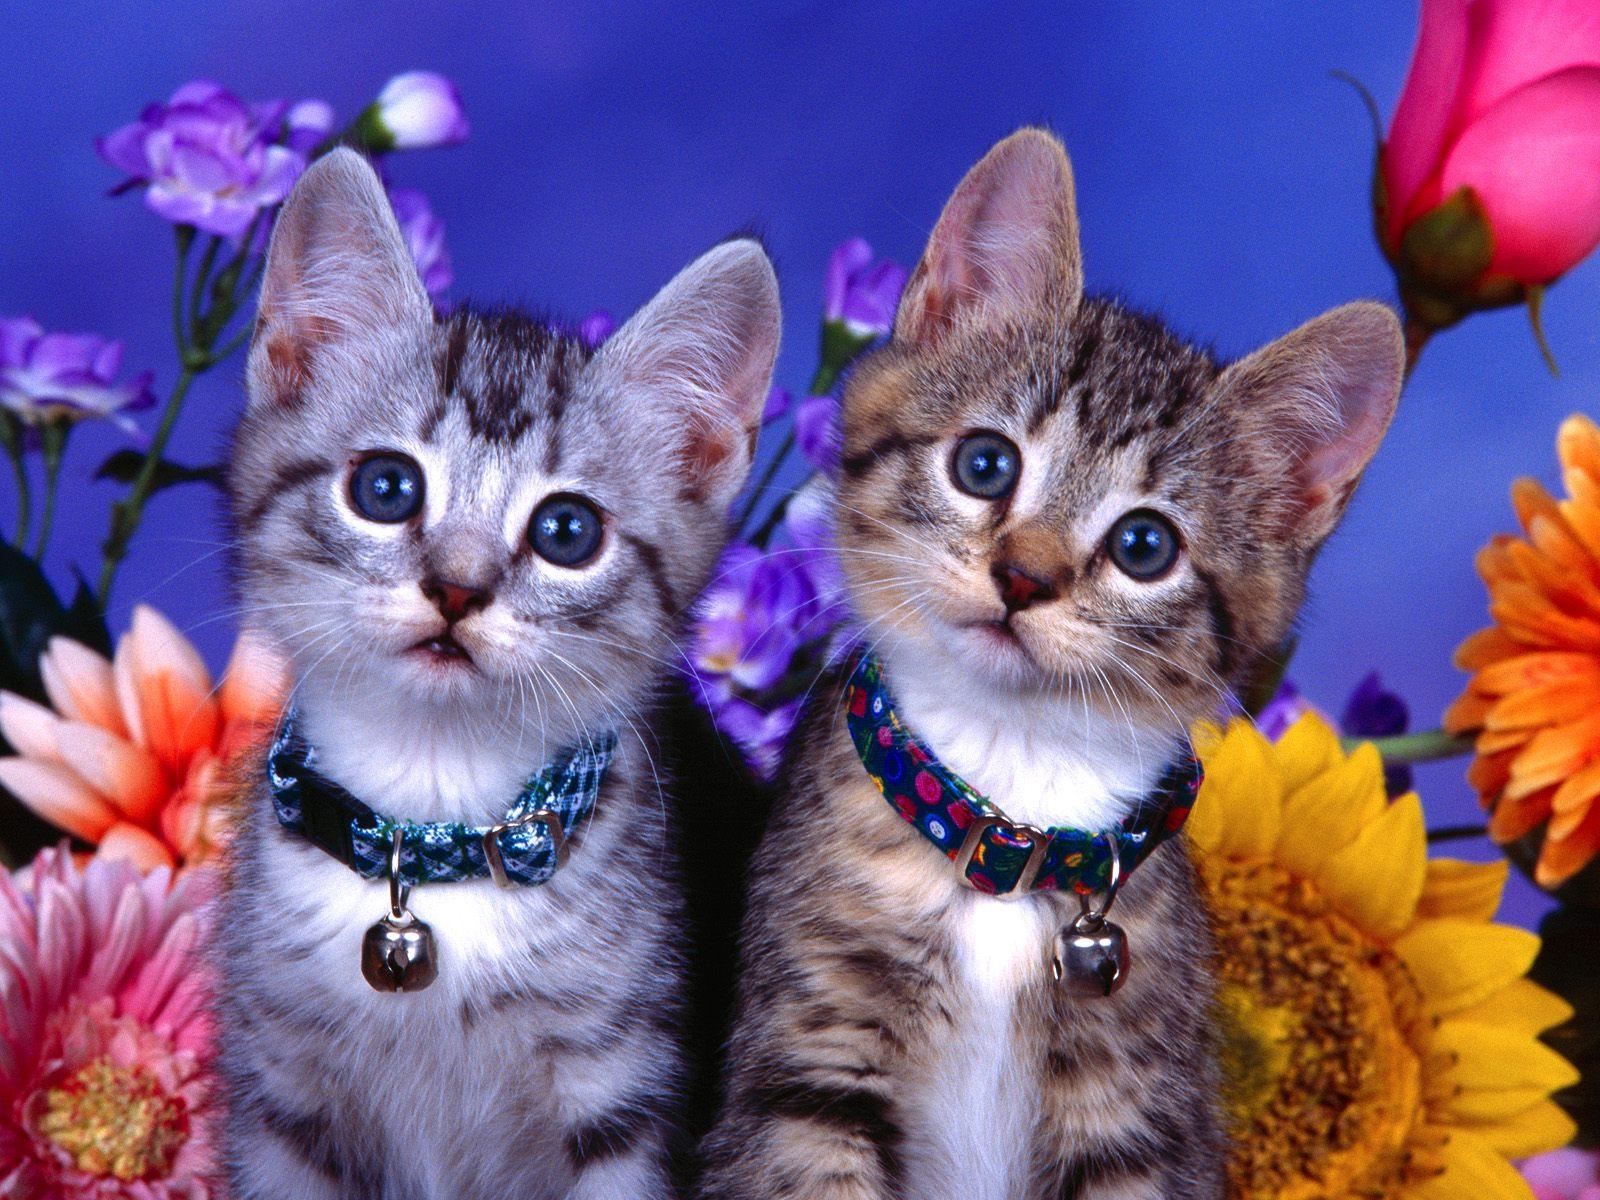 Puter Screen Saver PC Desktop Wallpaper Cat With Flowers